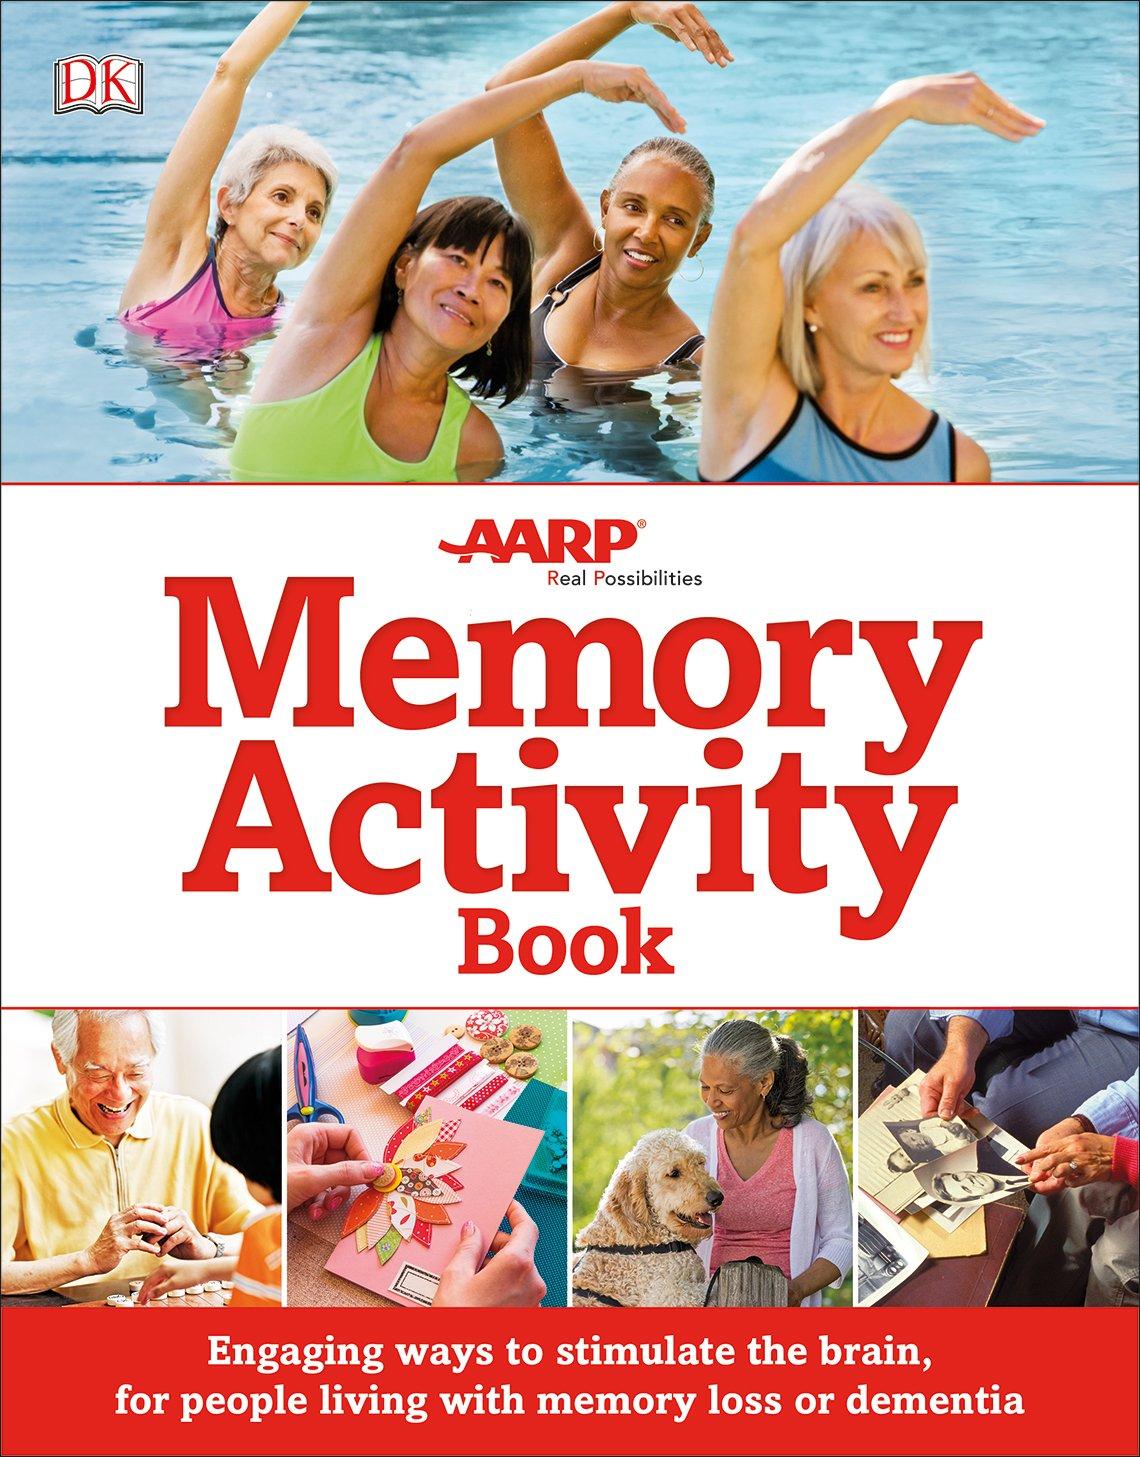 A-A-R-P memory  activity book